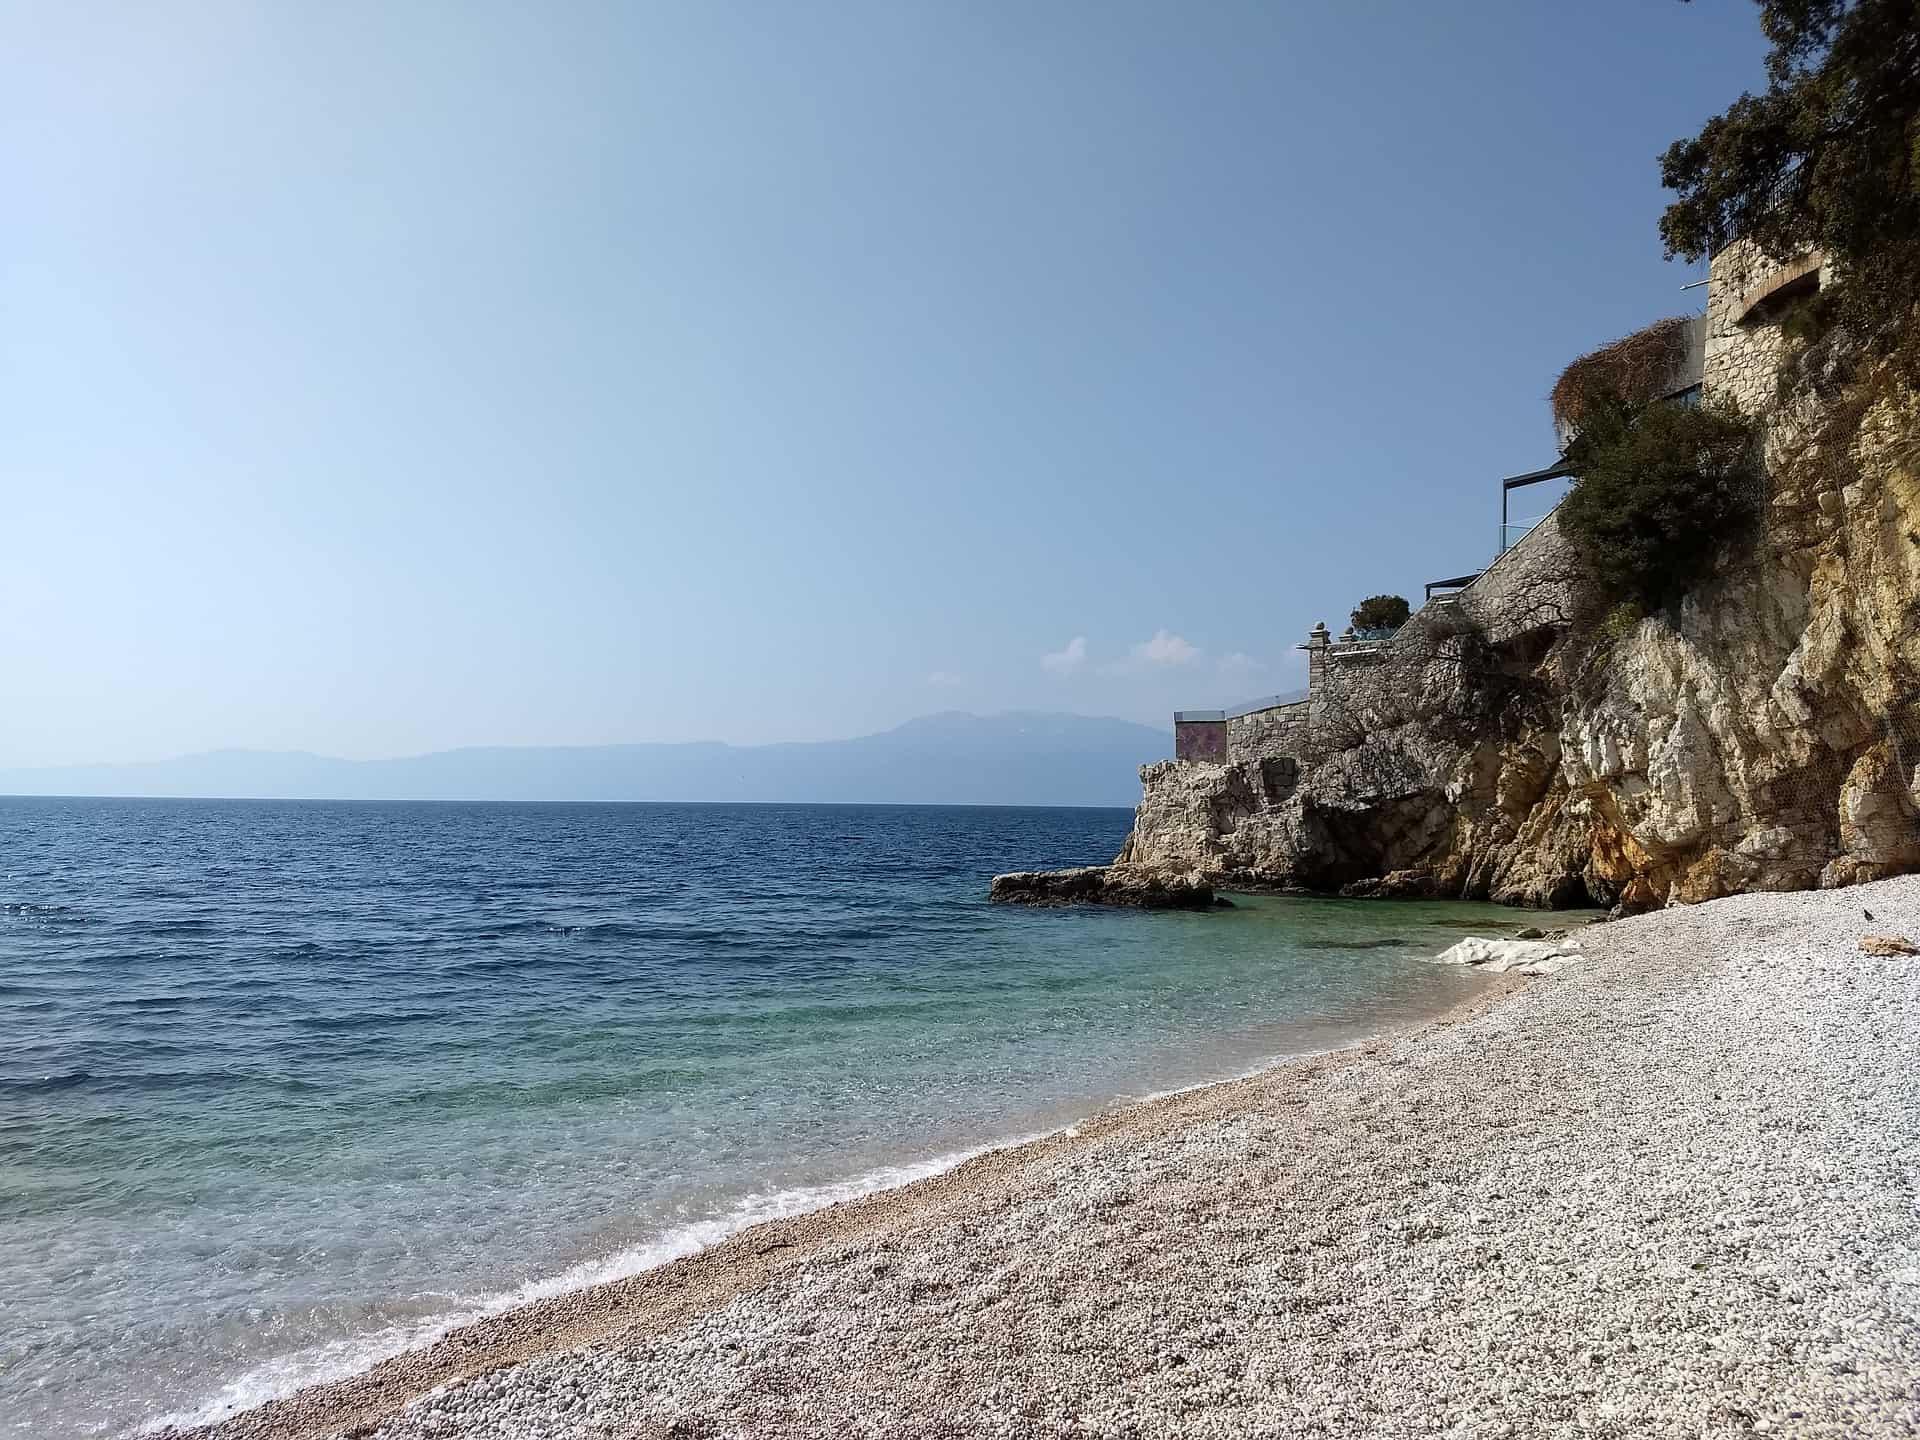 Flüge nach Rijeka nur 9,99€ Hin- & Rückflug nach Kroatien